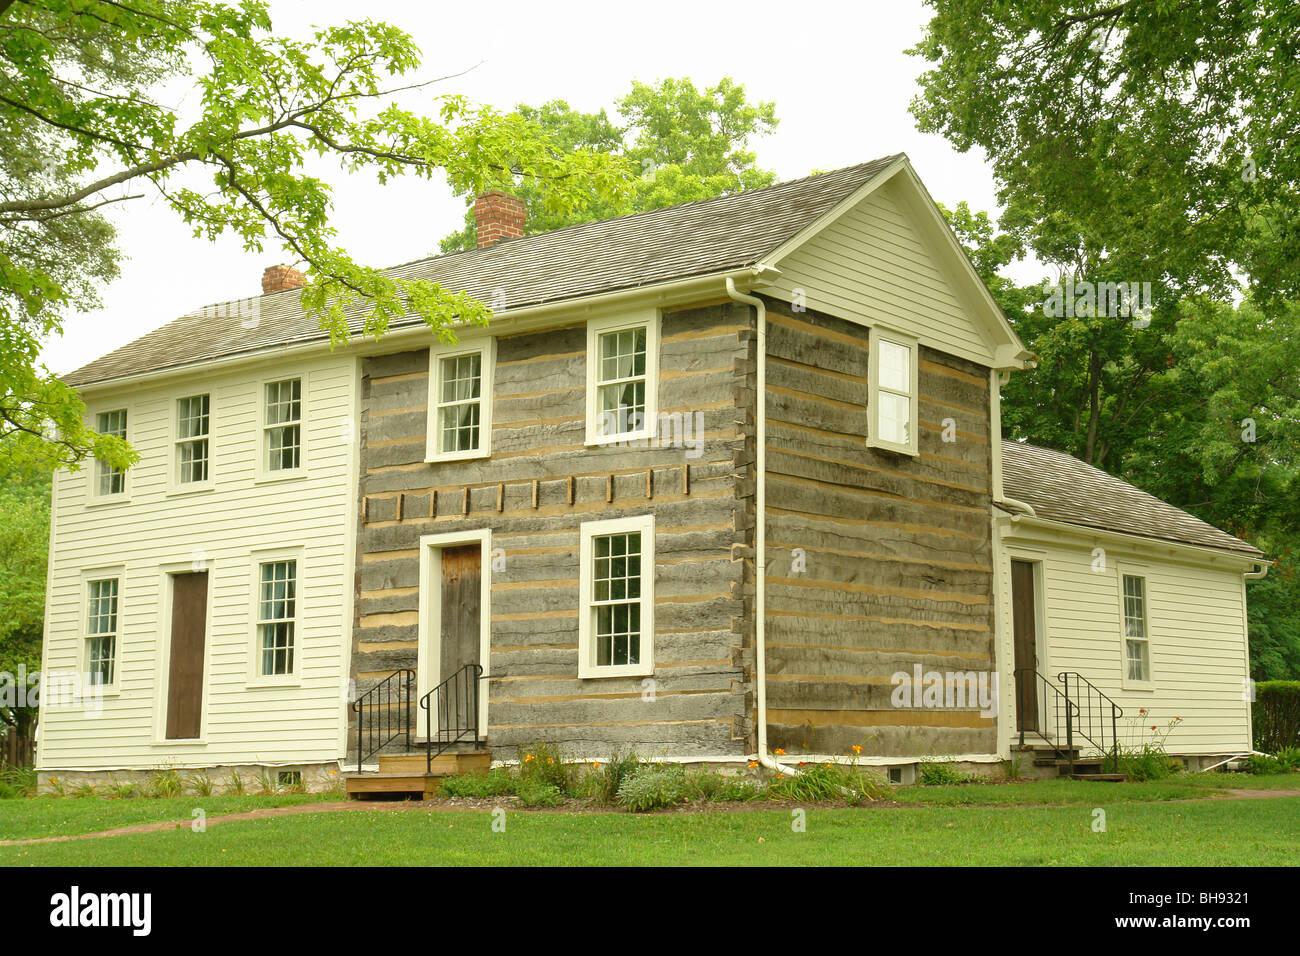 Joseph Smith Stock Photos & Joseph Smith Stock Images - Page